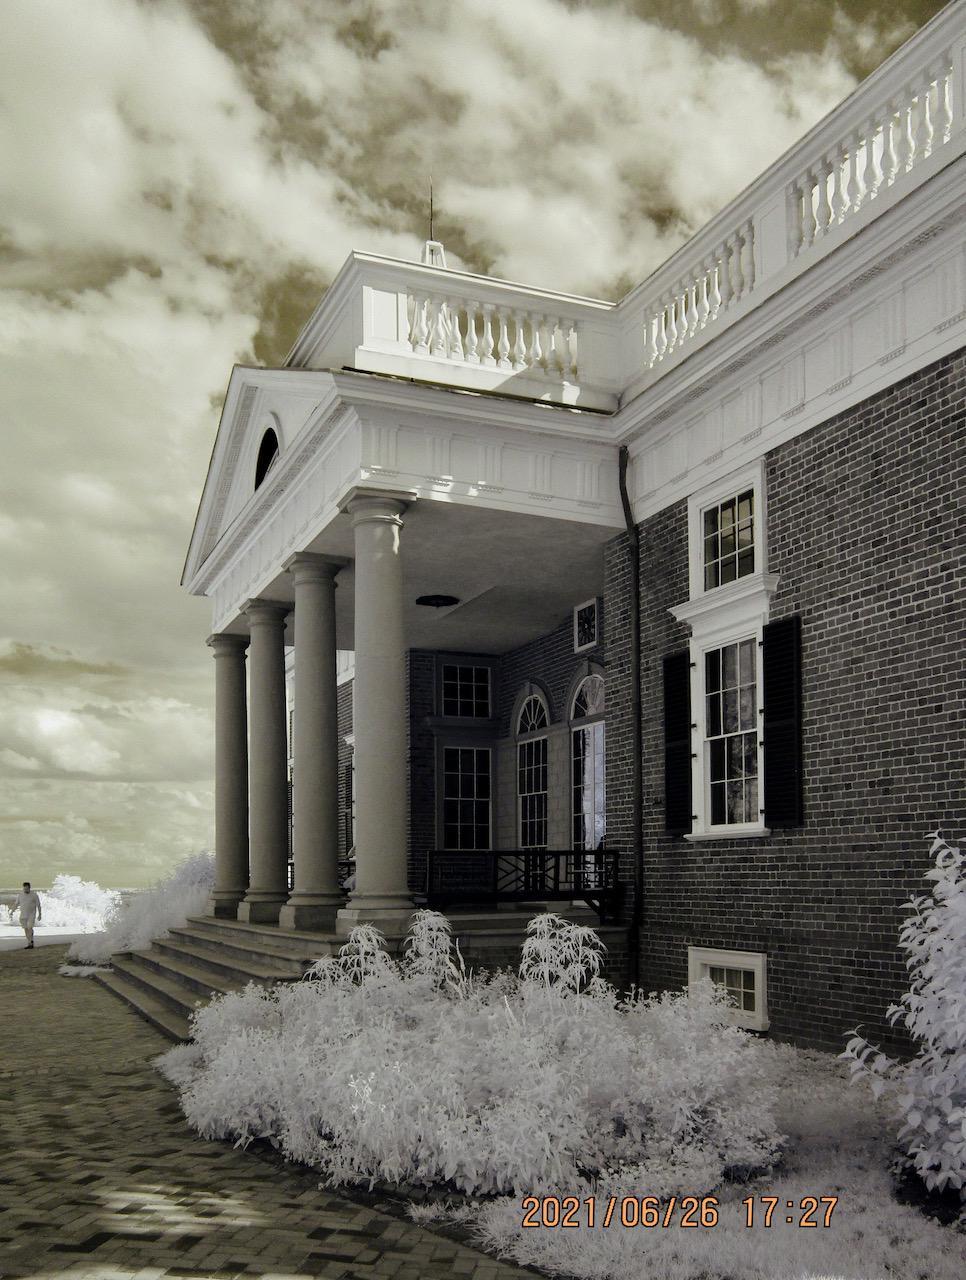 Exterior shot of Jefferson's home in Charlotteville, VA